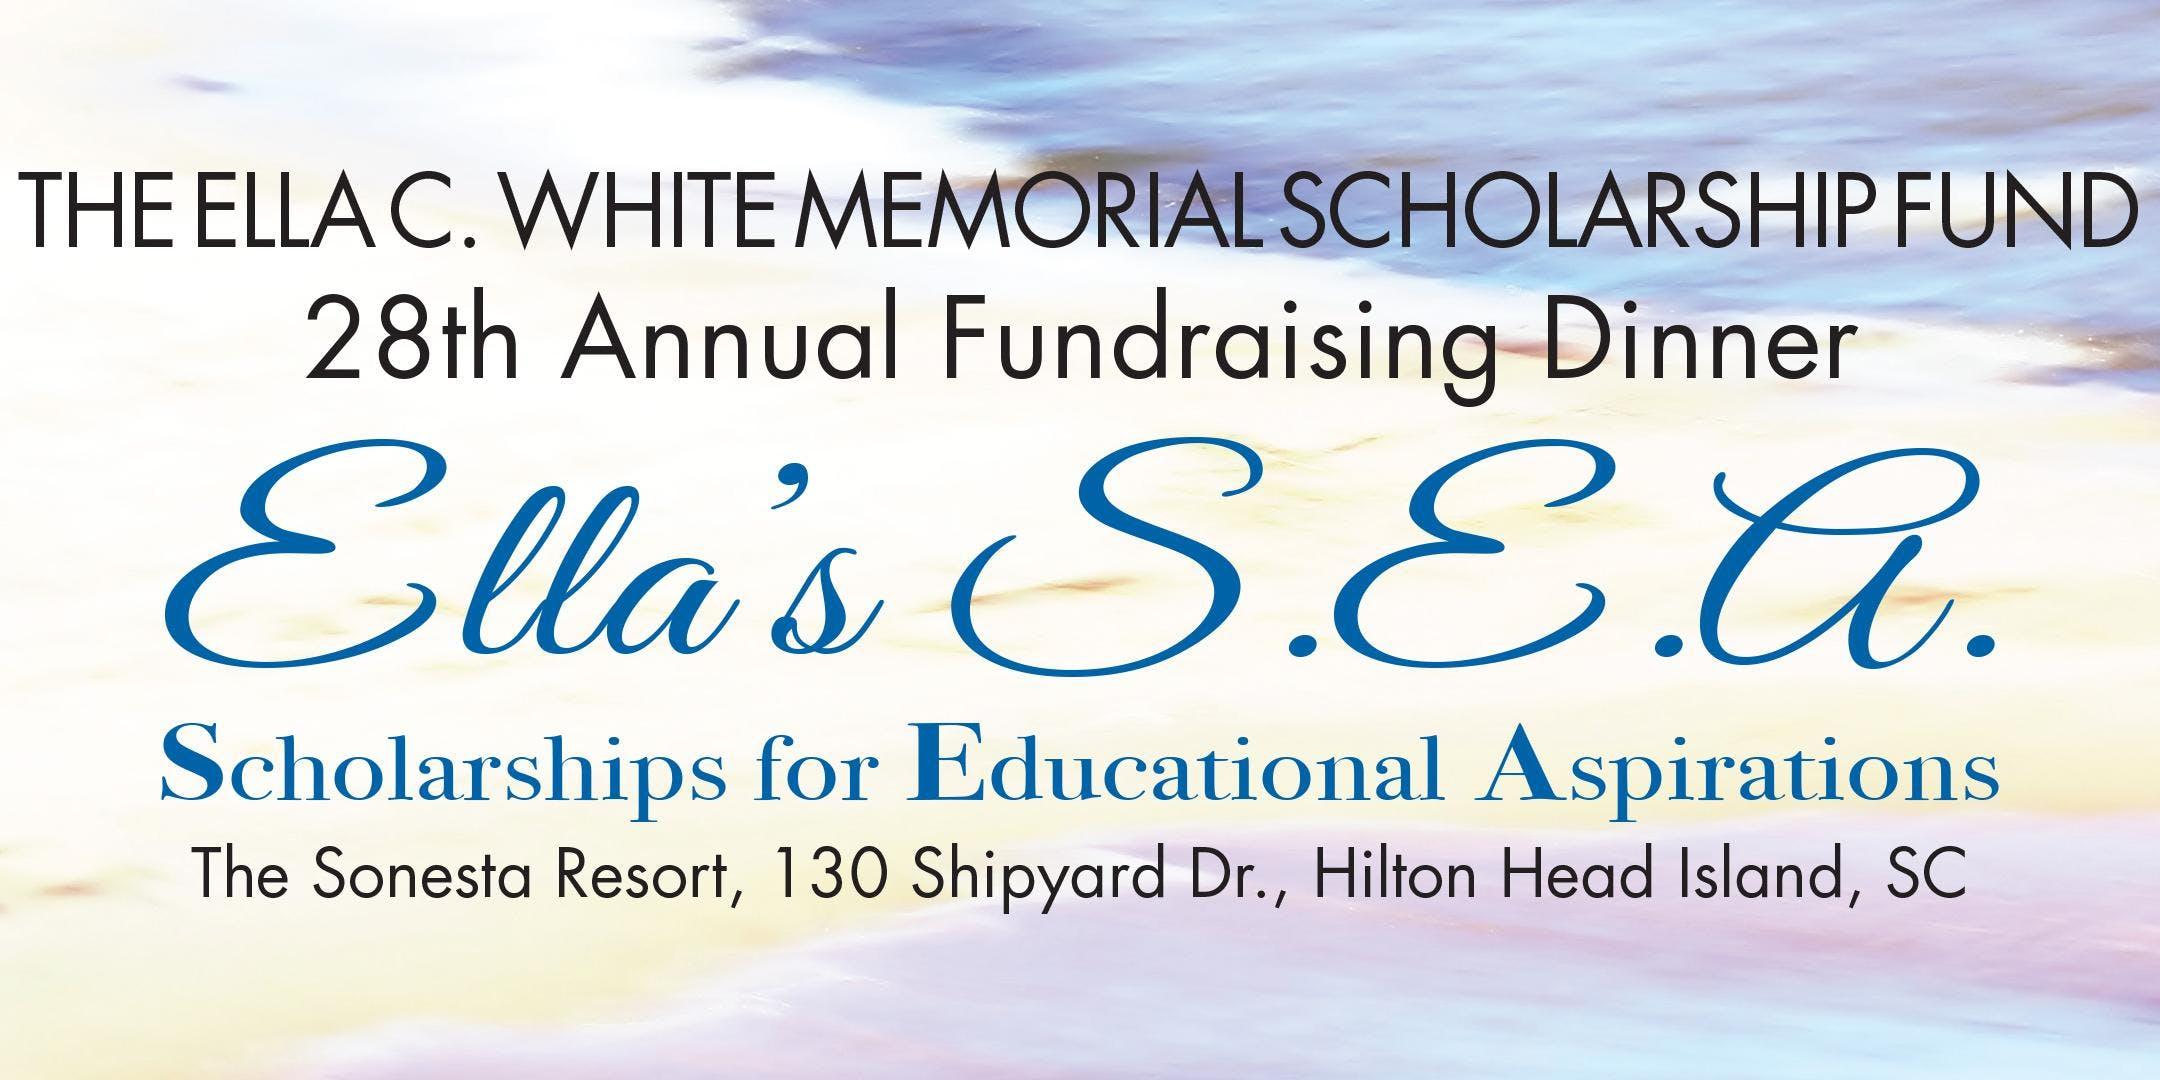 Ella C. White Memorial Scholarship Fund Dinner - Ella's S.E.A.